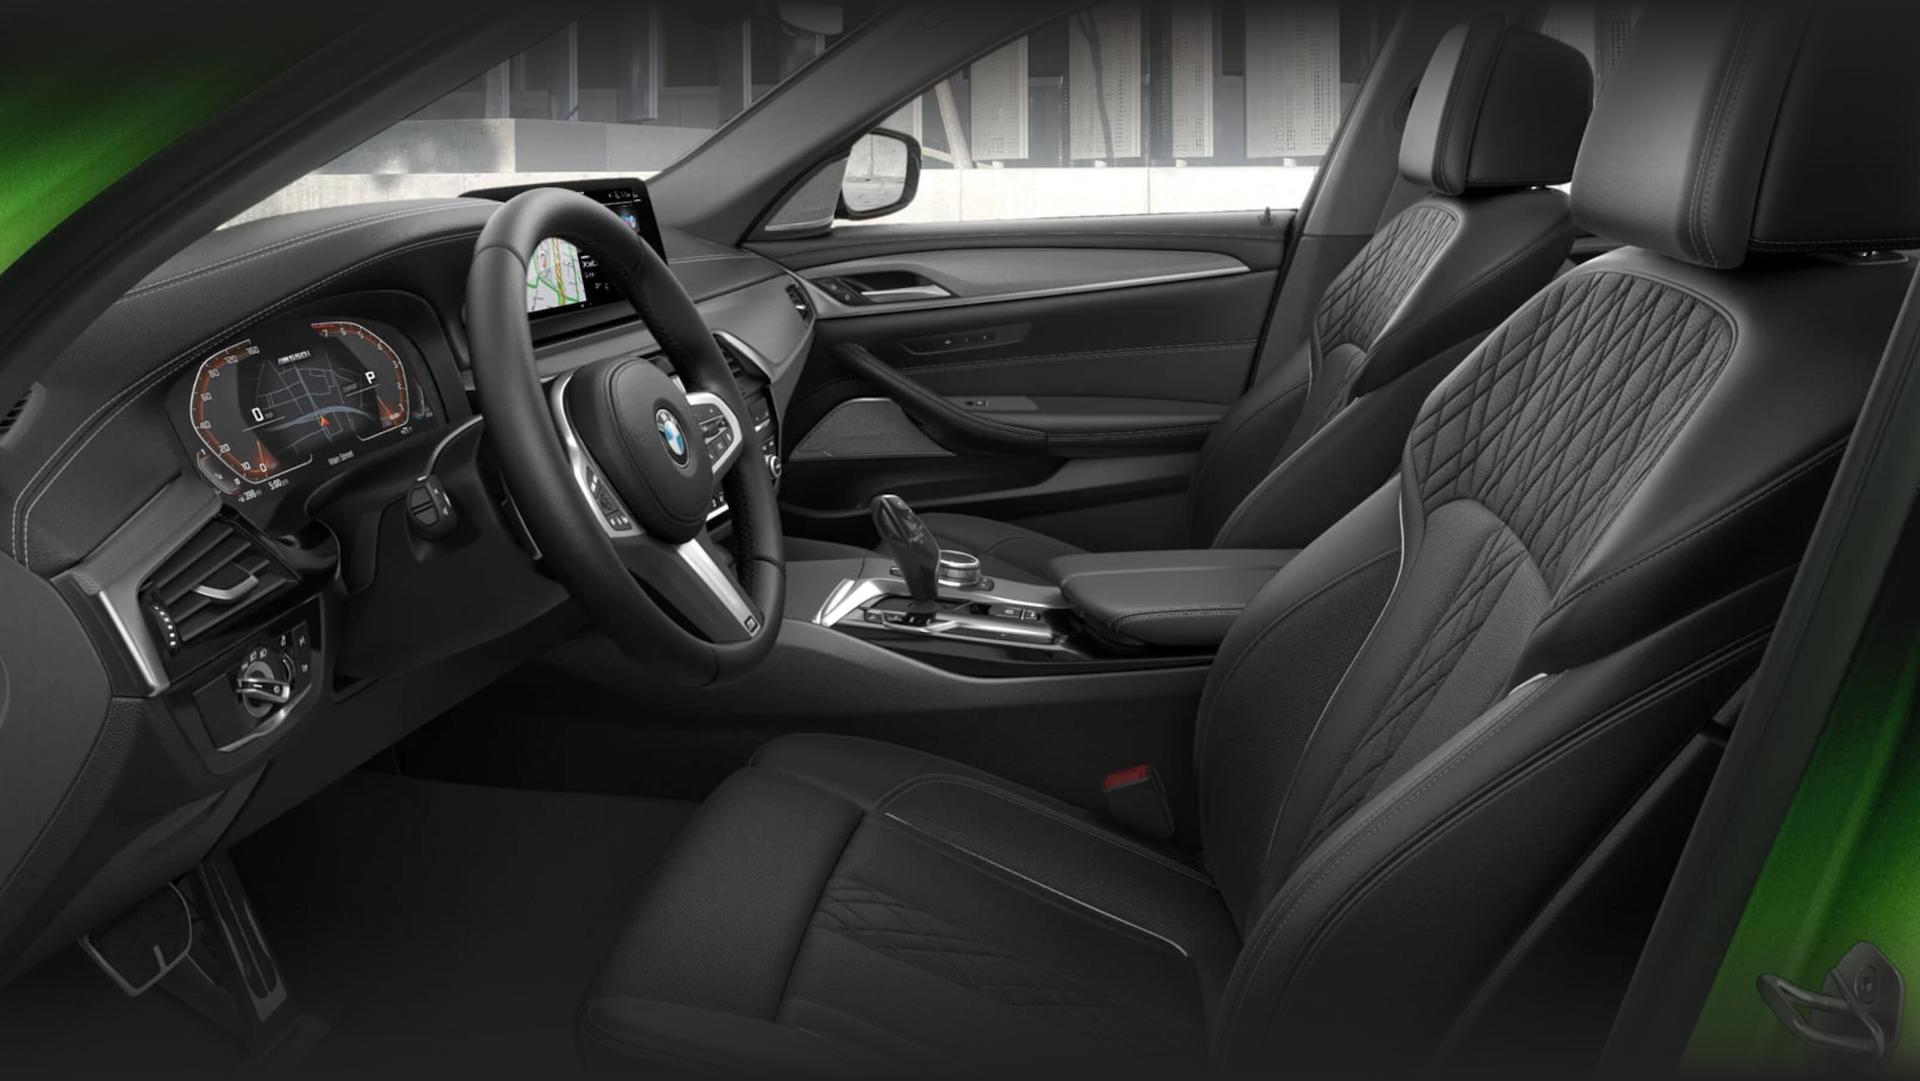 Photos of the 2021 BMW 5 series interior